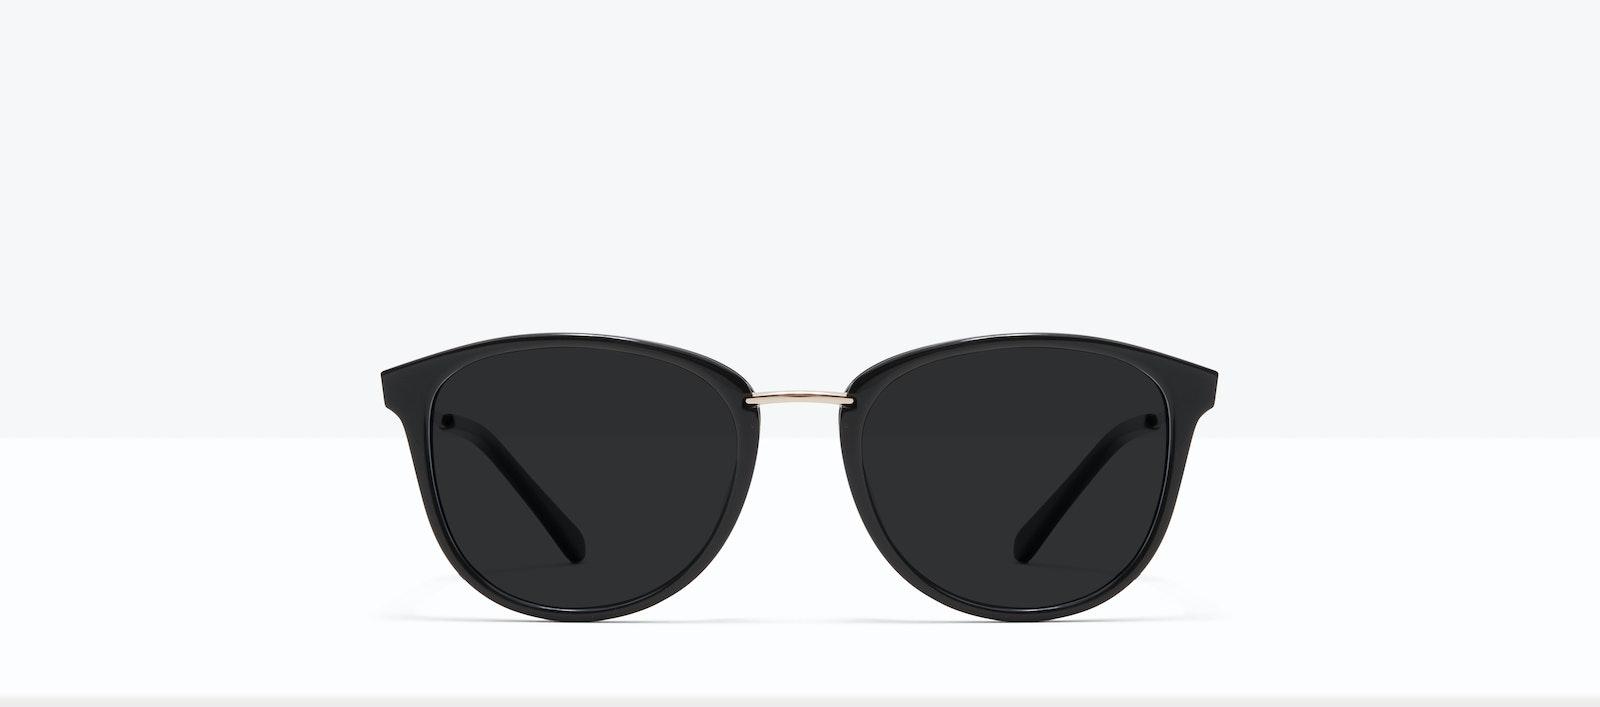 Affordable Fashion Glasses Square Round Sunglasses Women Bella XS Black Front